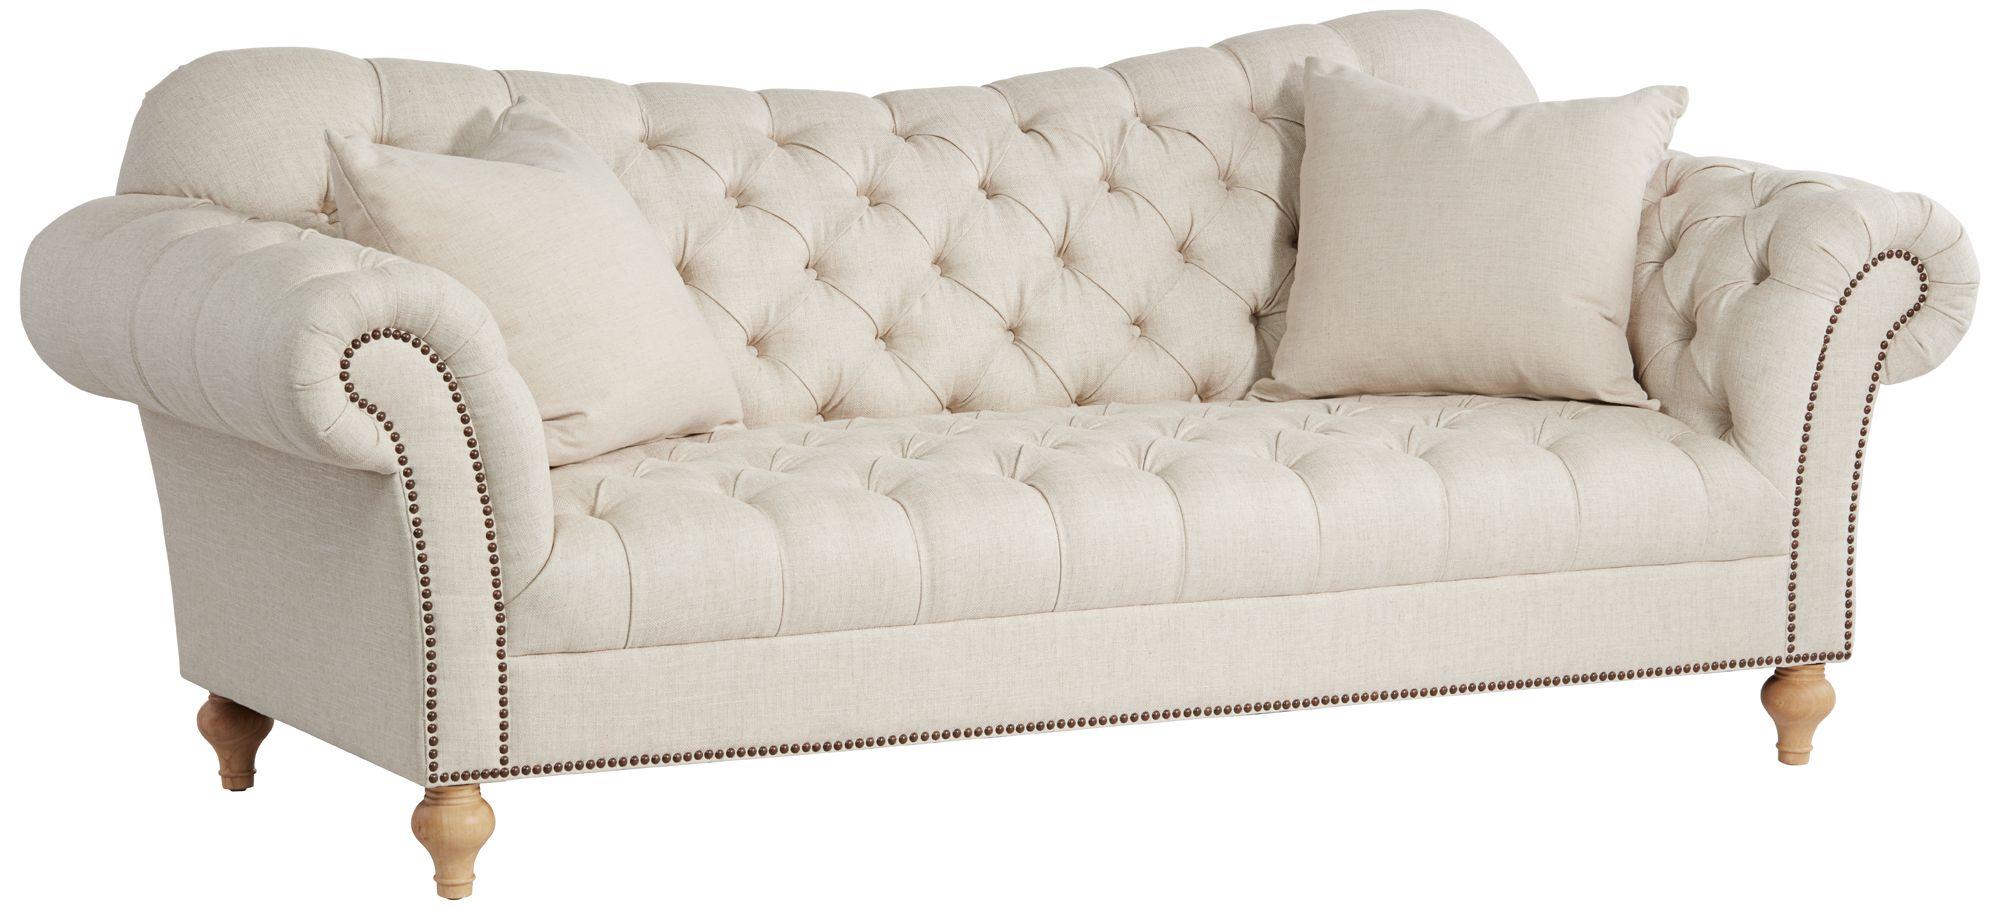 Vanna Brussel Linen Tufted Sofa With Linen Down Pillows